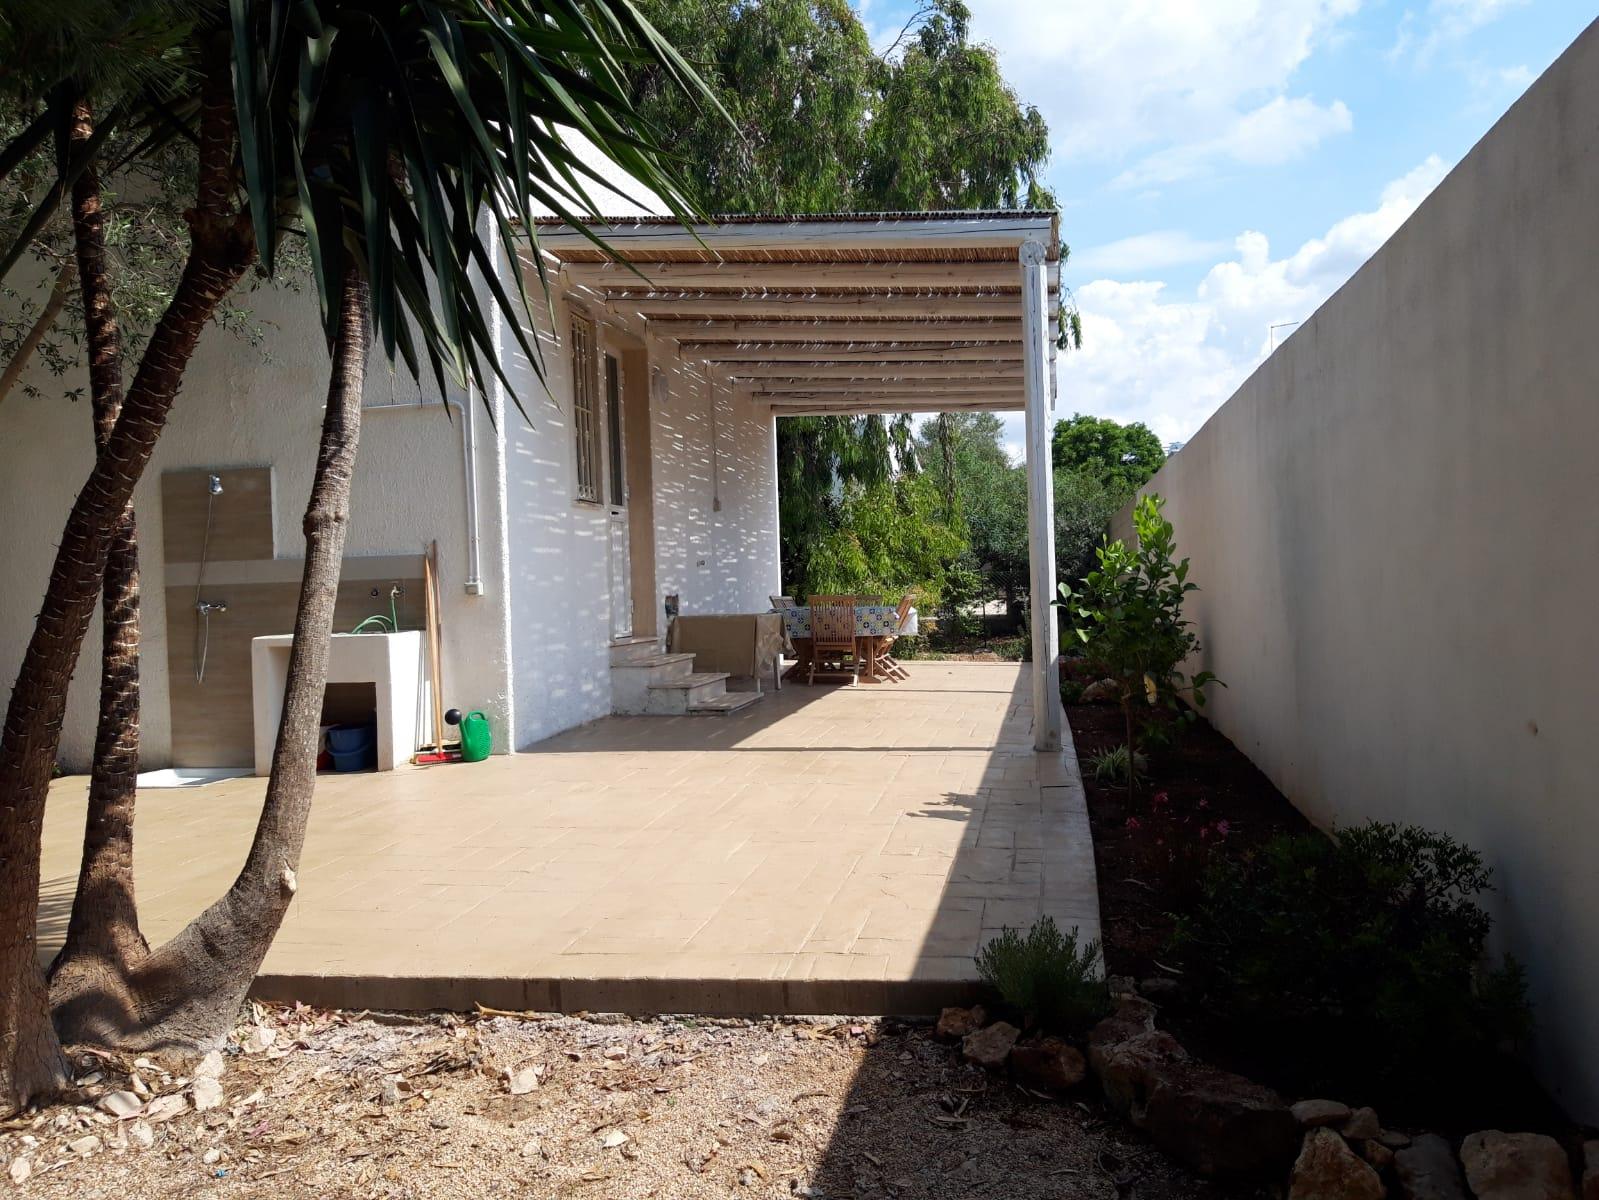 Ferienhaus Villa Mariposa n°3, only 200 meters from the beach (2354067), Porto Cesareo, Lecce, Apulien, Italien, Bild 26